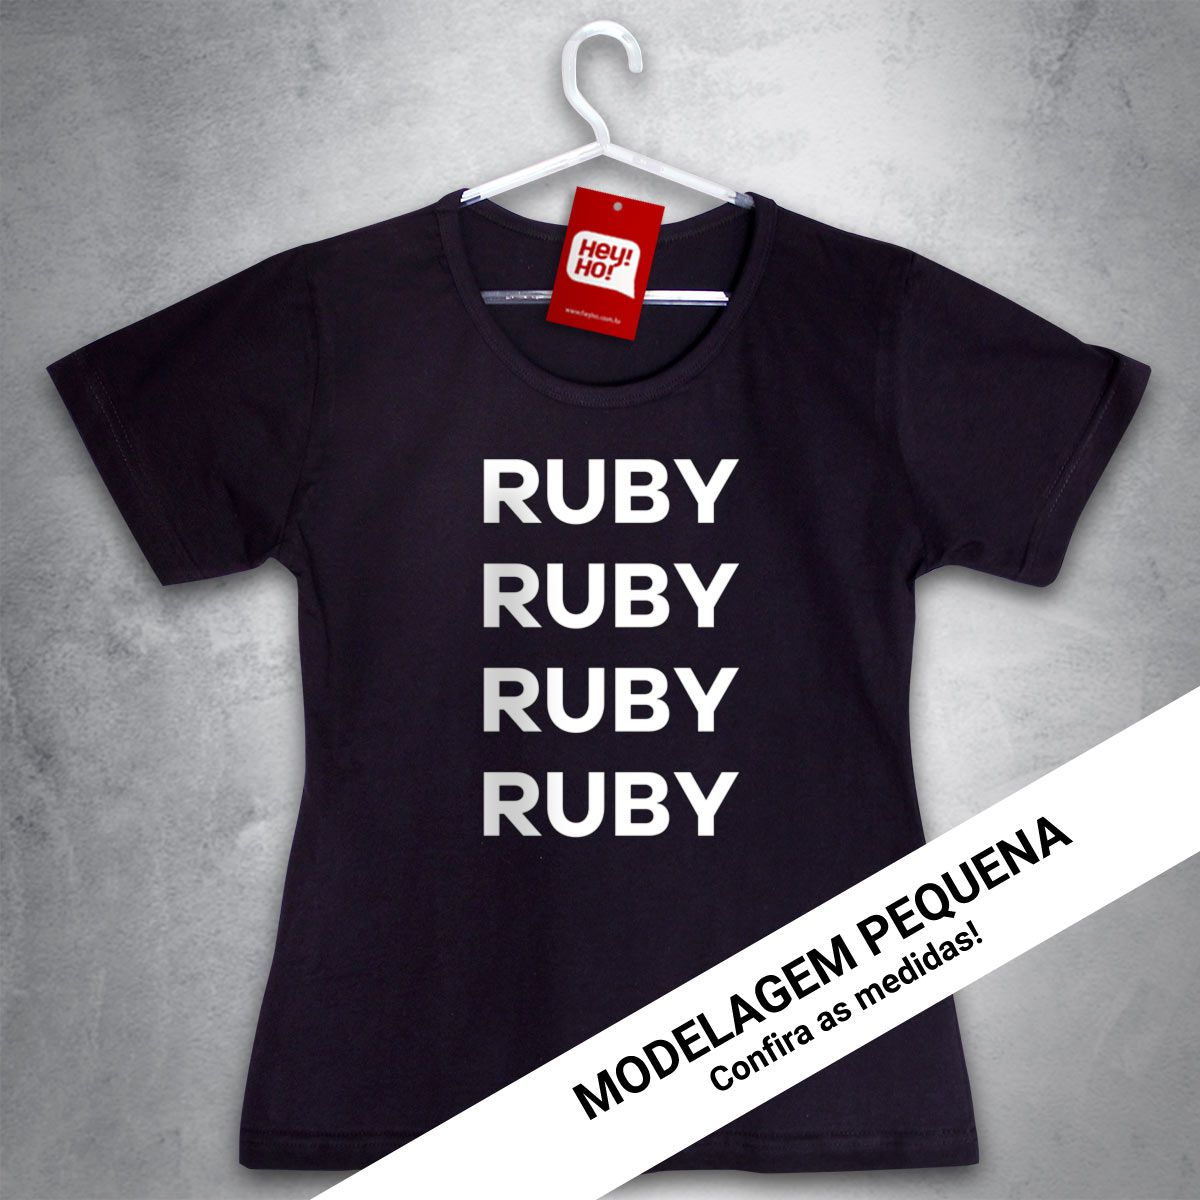 KAISER CHIEFS - Ruby Ruby Ruby Ruby